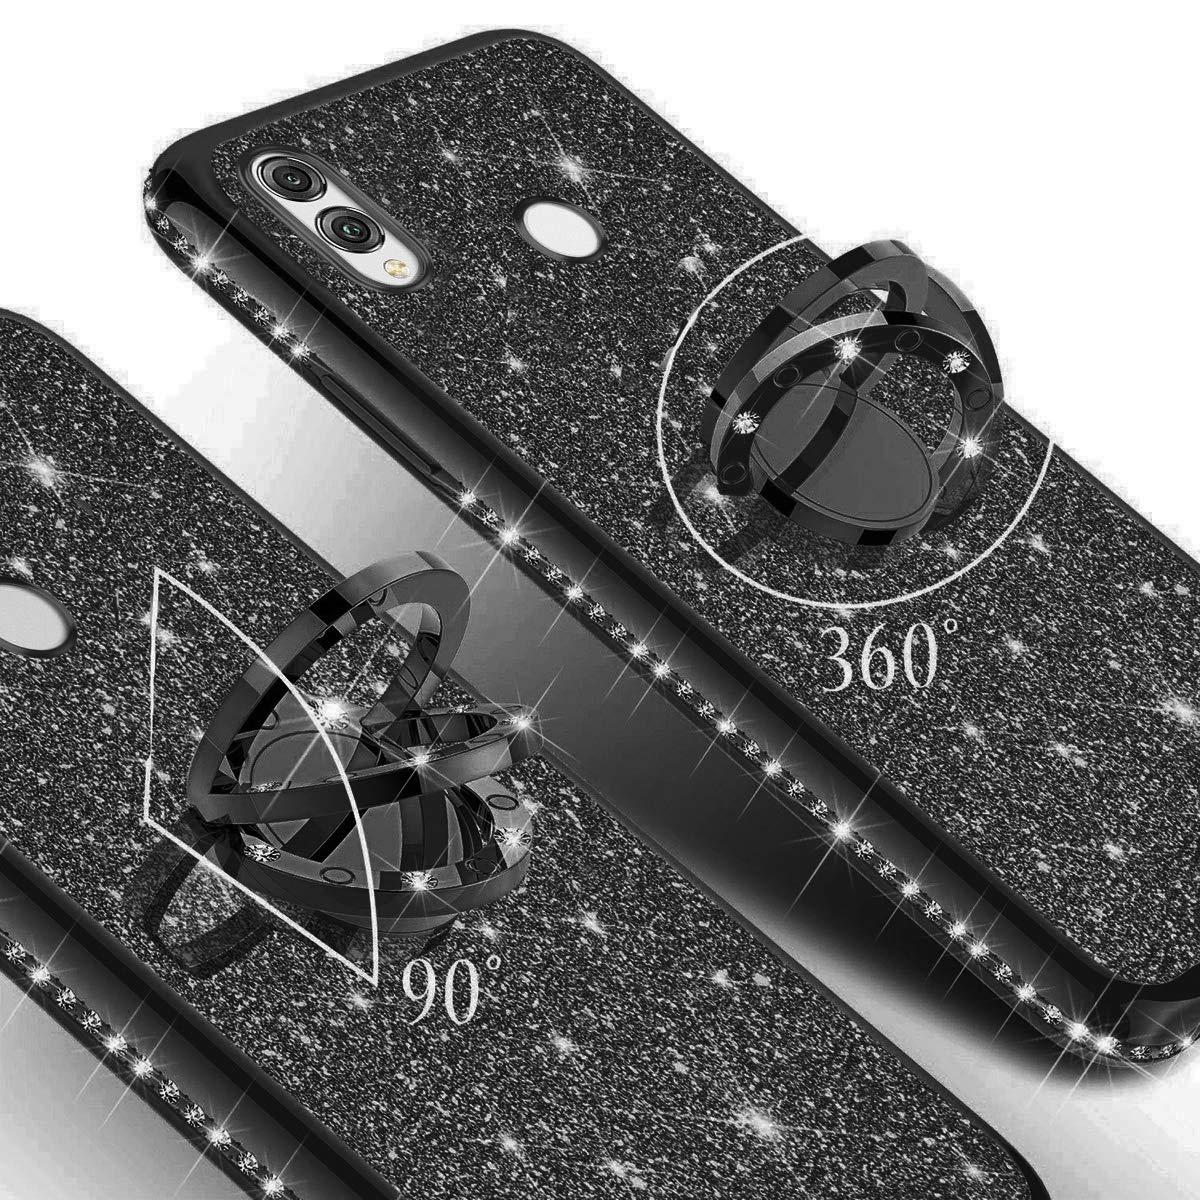 SainCat Coque Compatible avec Huawei Honor 8X Max Silicone Paillette Glitter Strass Ultra Slim Antichoc Support Anneau Ultra Resistante TPU Bumper Coque Placage-Noir